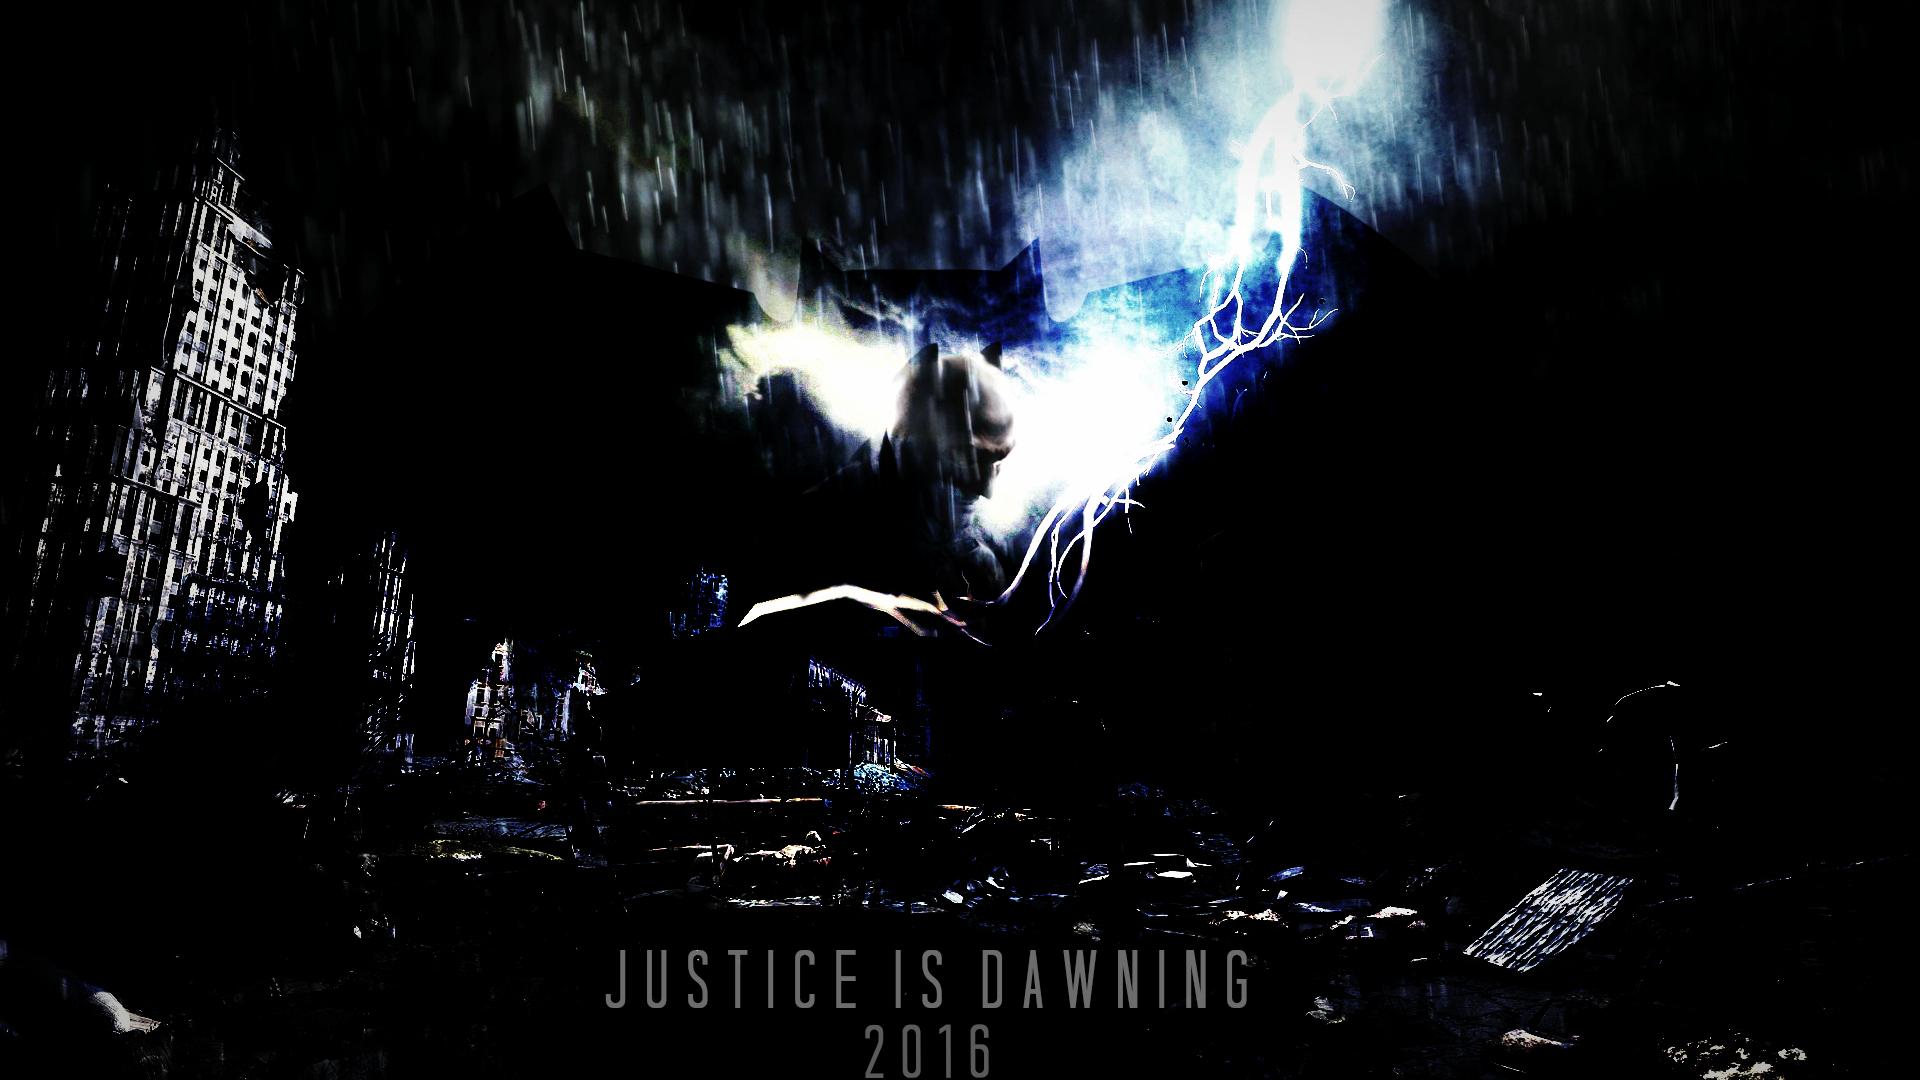 Batman V Superman Dawn Of Justice Wallpaper 2016 By